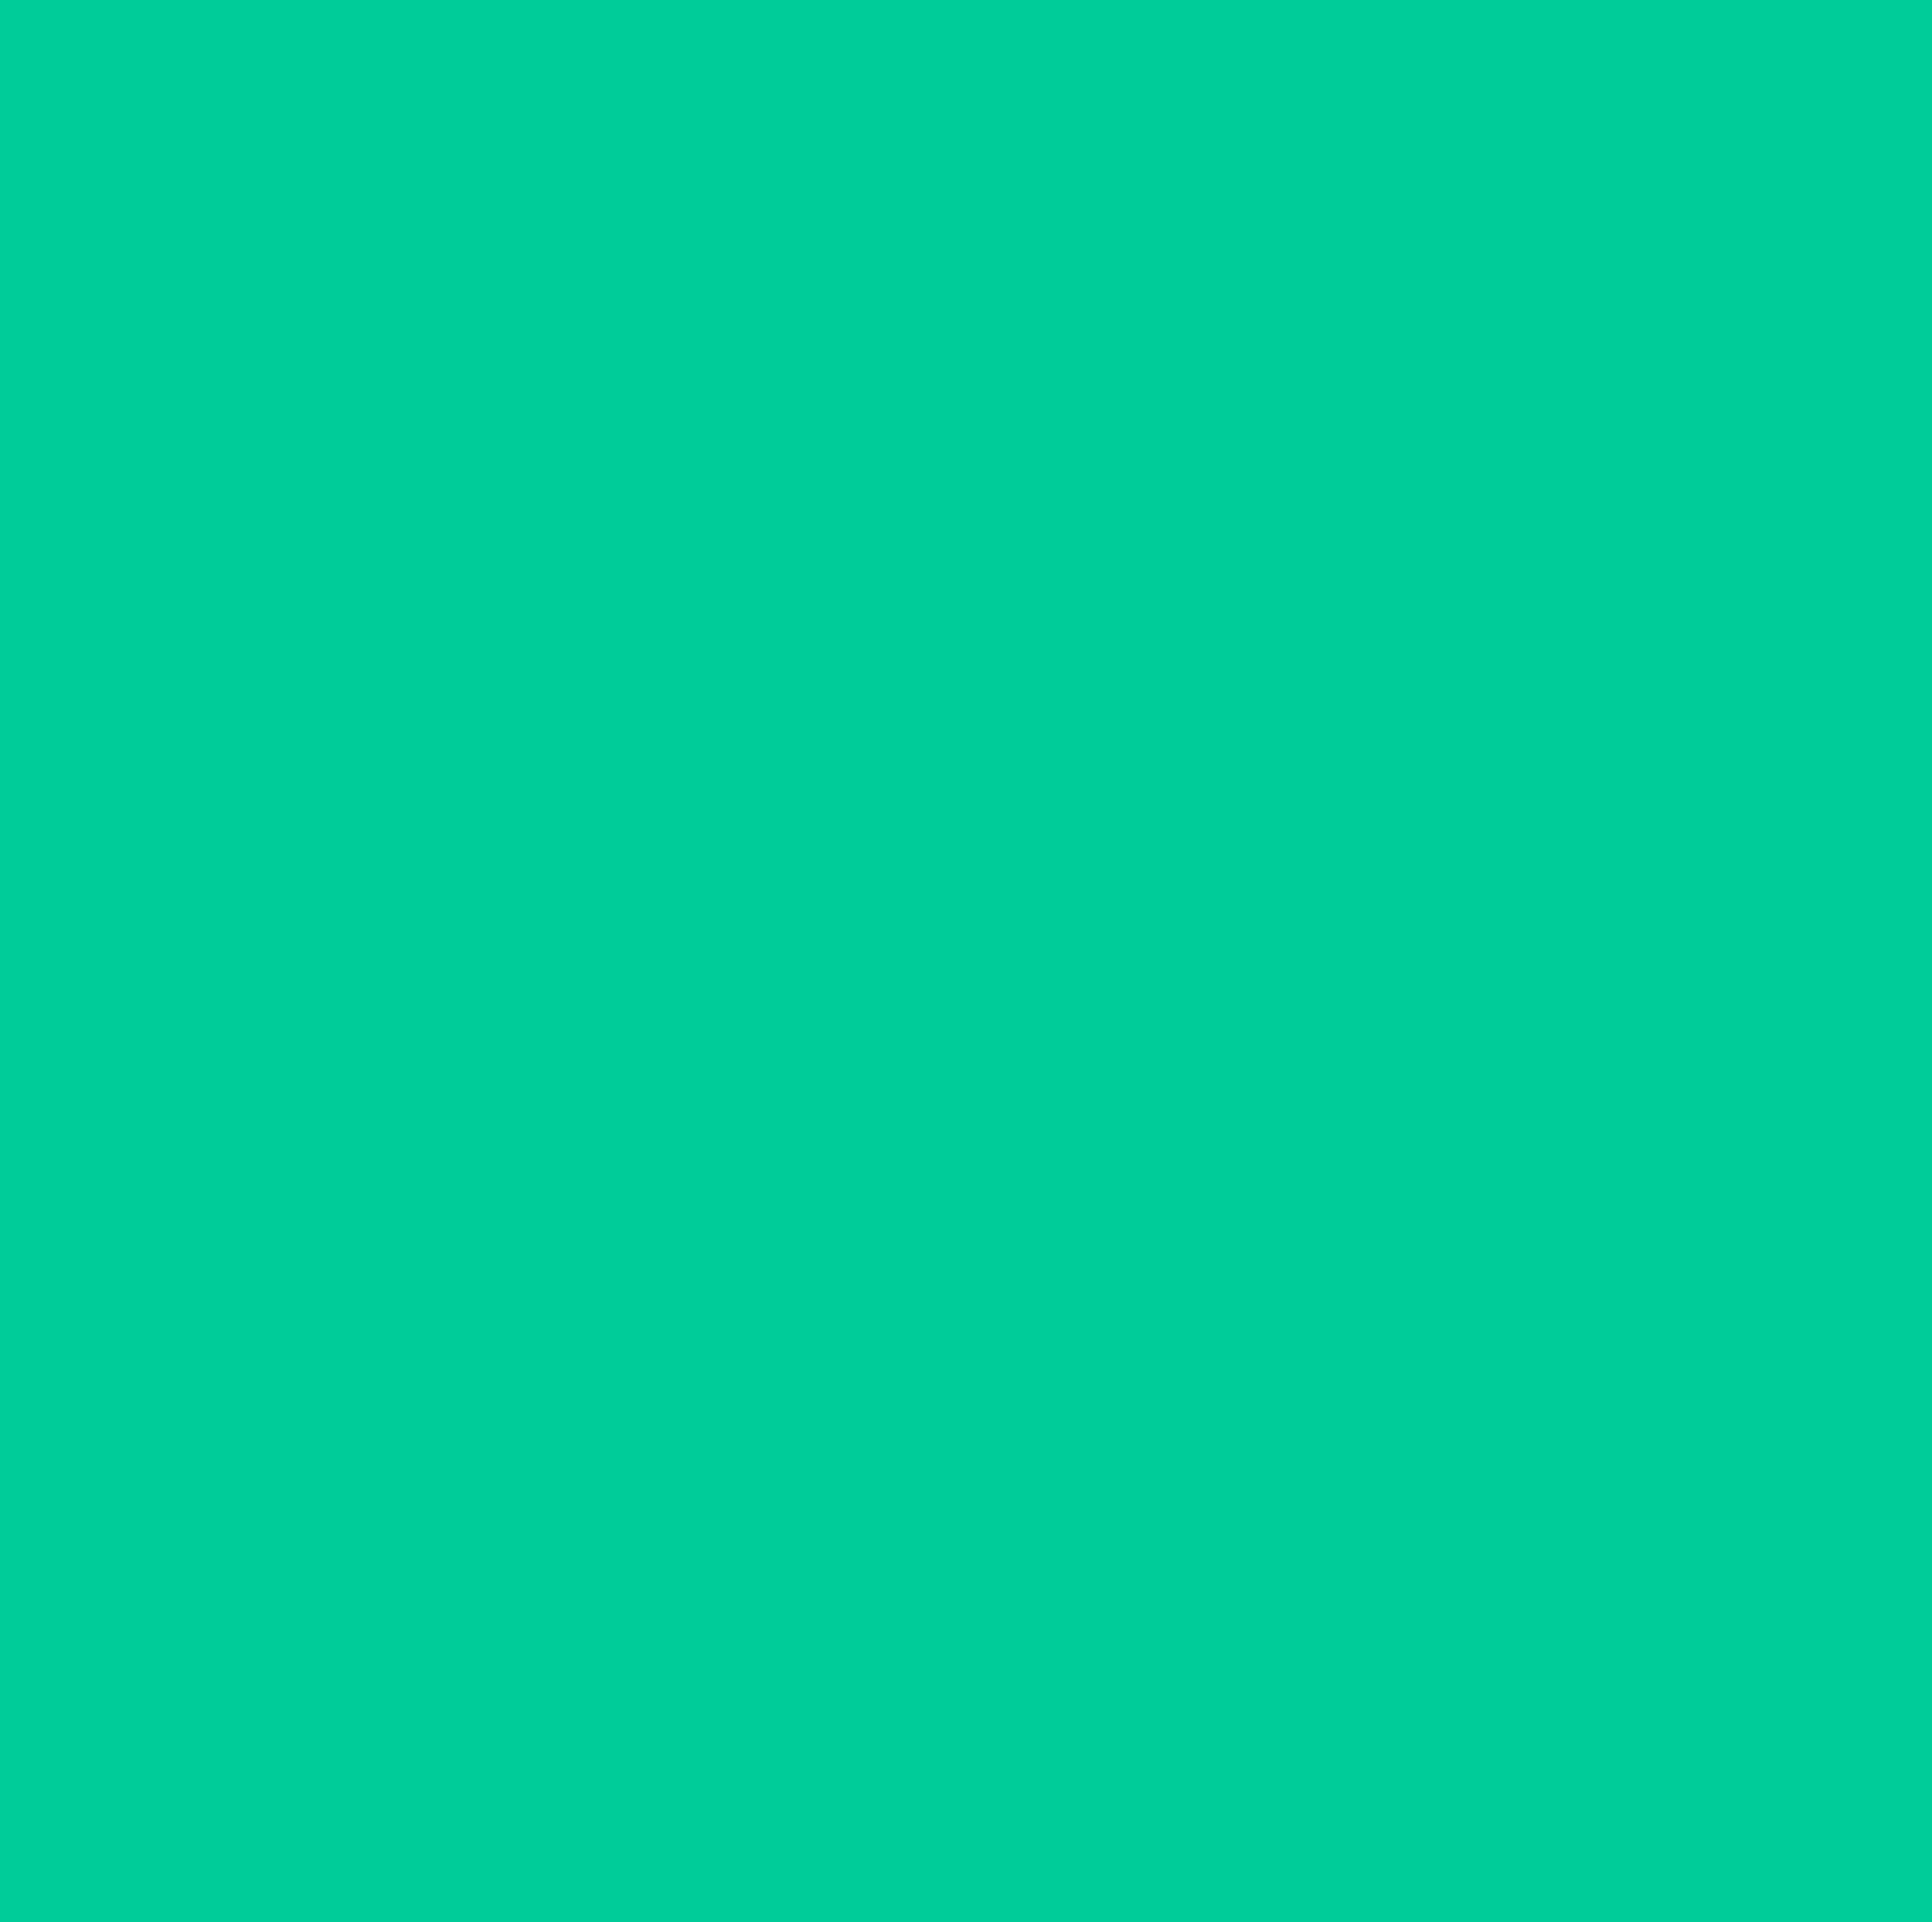 summer_blank-color-theme-edition28